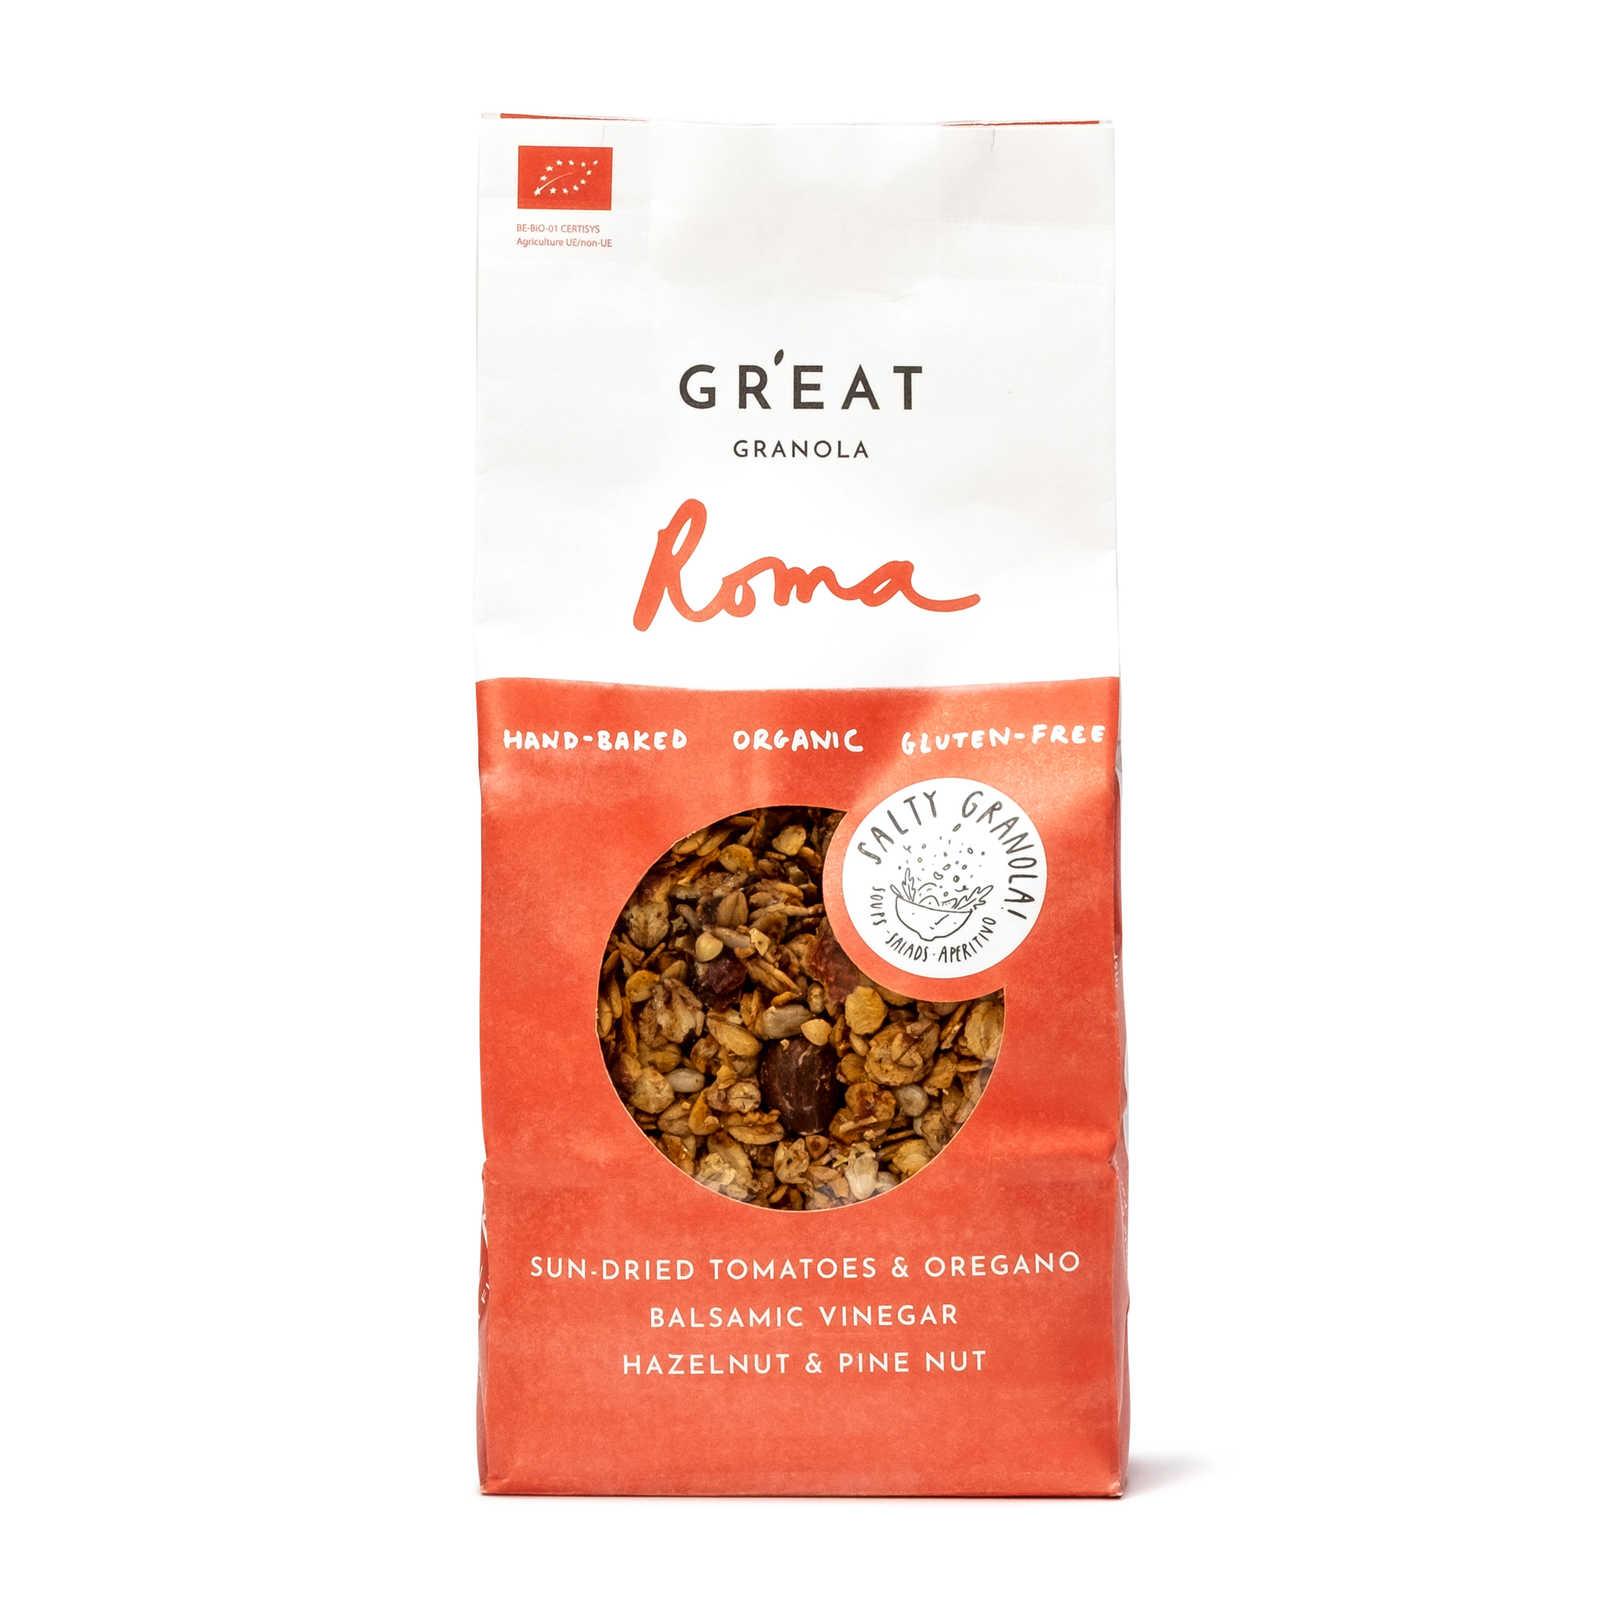 GREAT granola